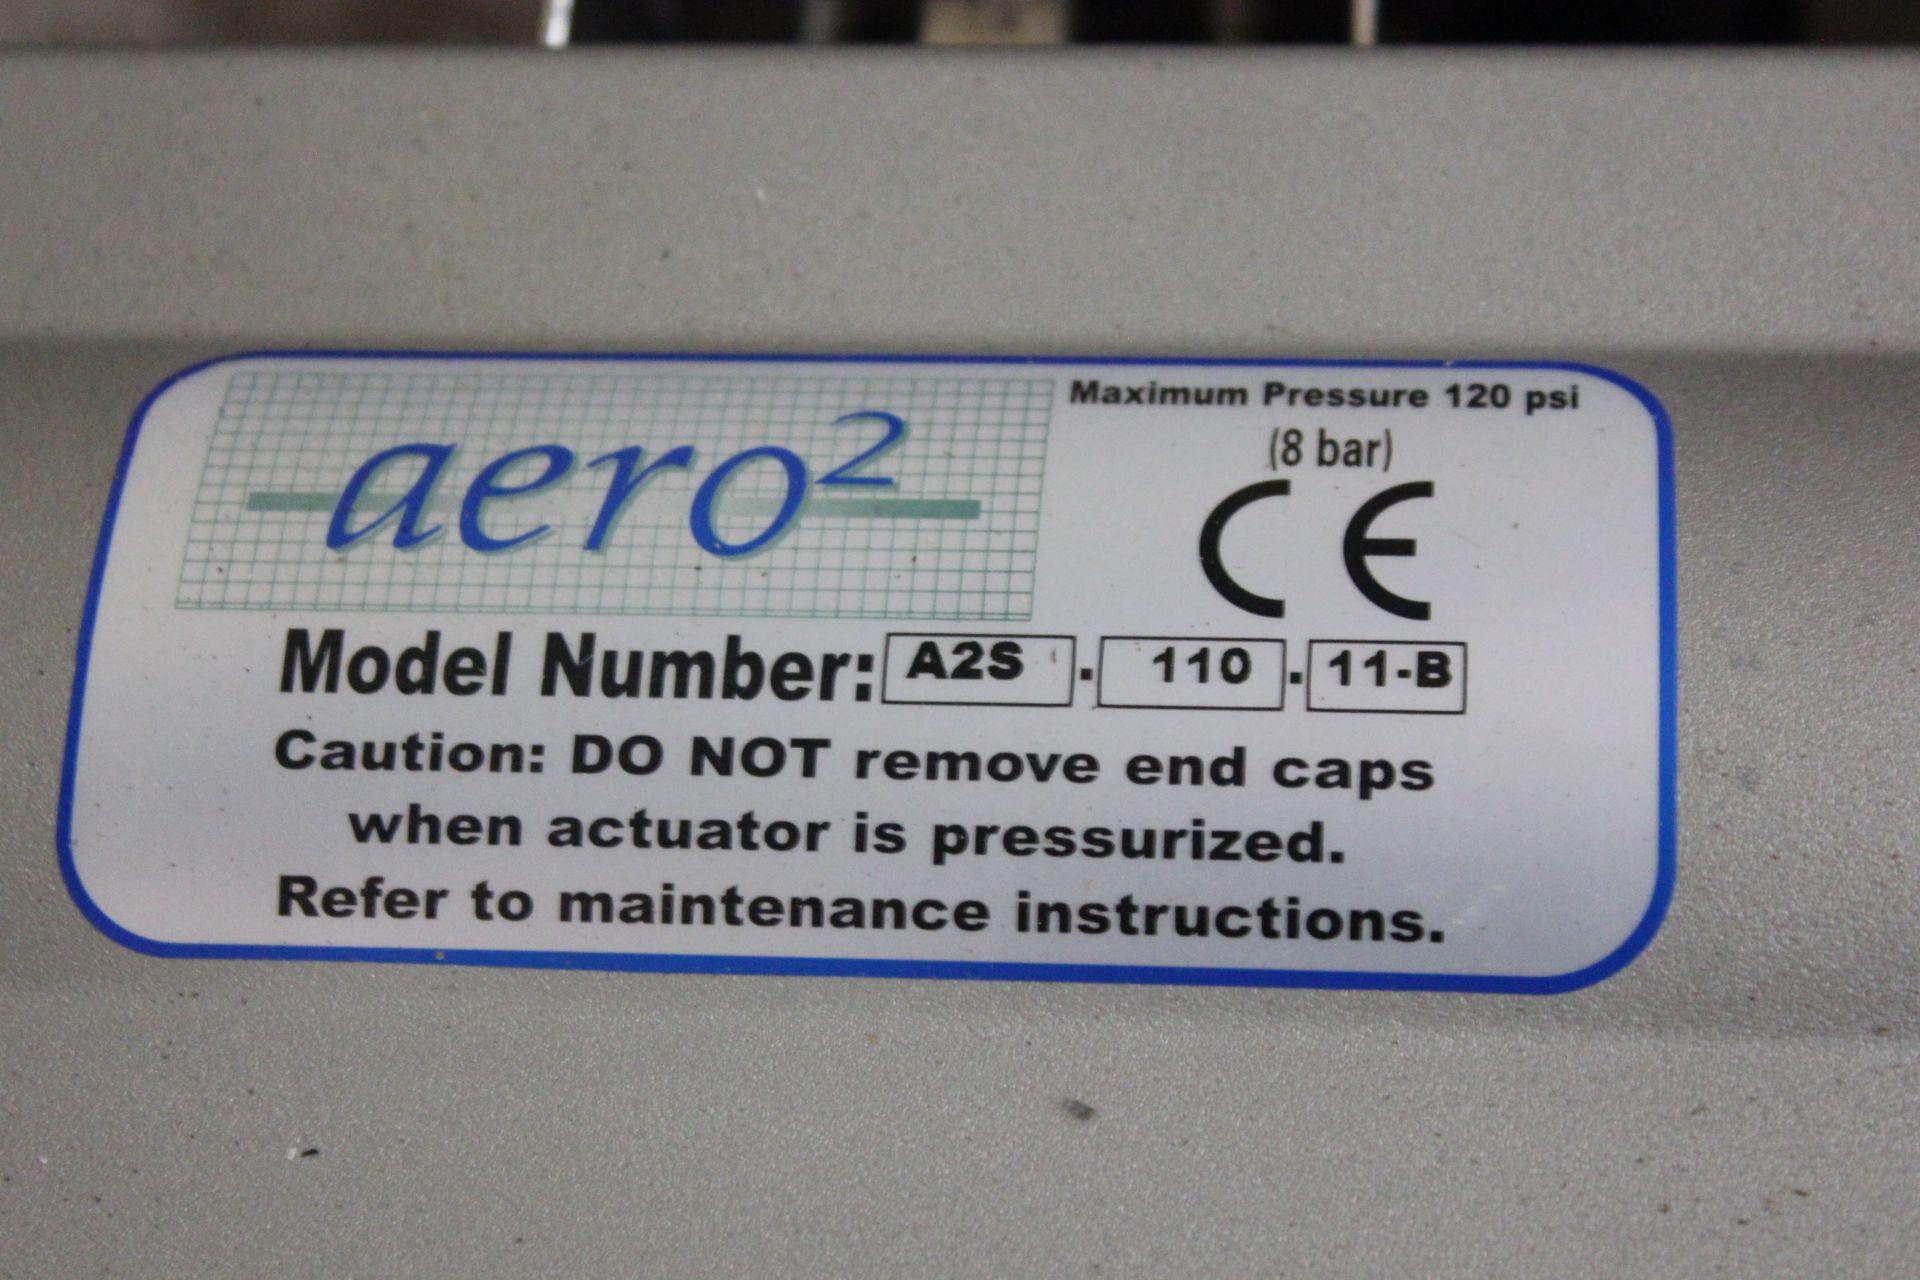 "NEW AERO2 PNEUMATIC ACTUATOR & 2"" BALL VALVE - Image 2 of 3"